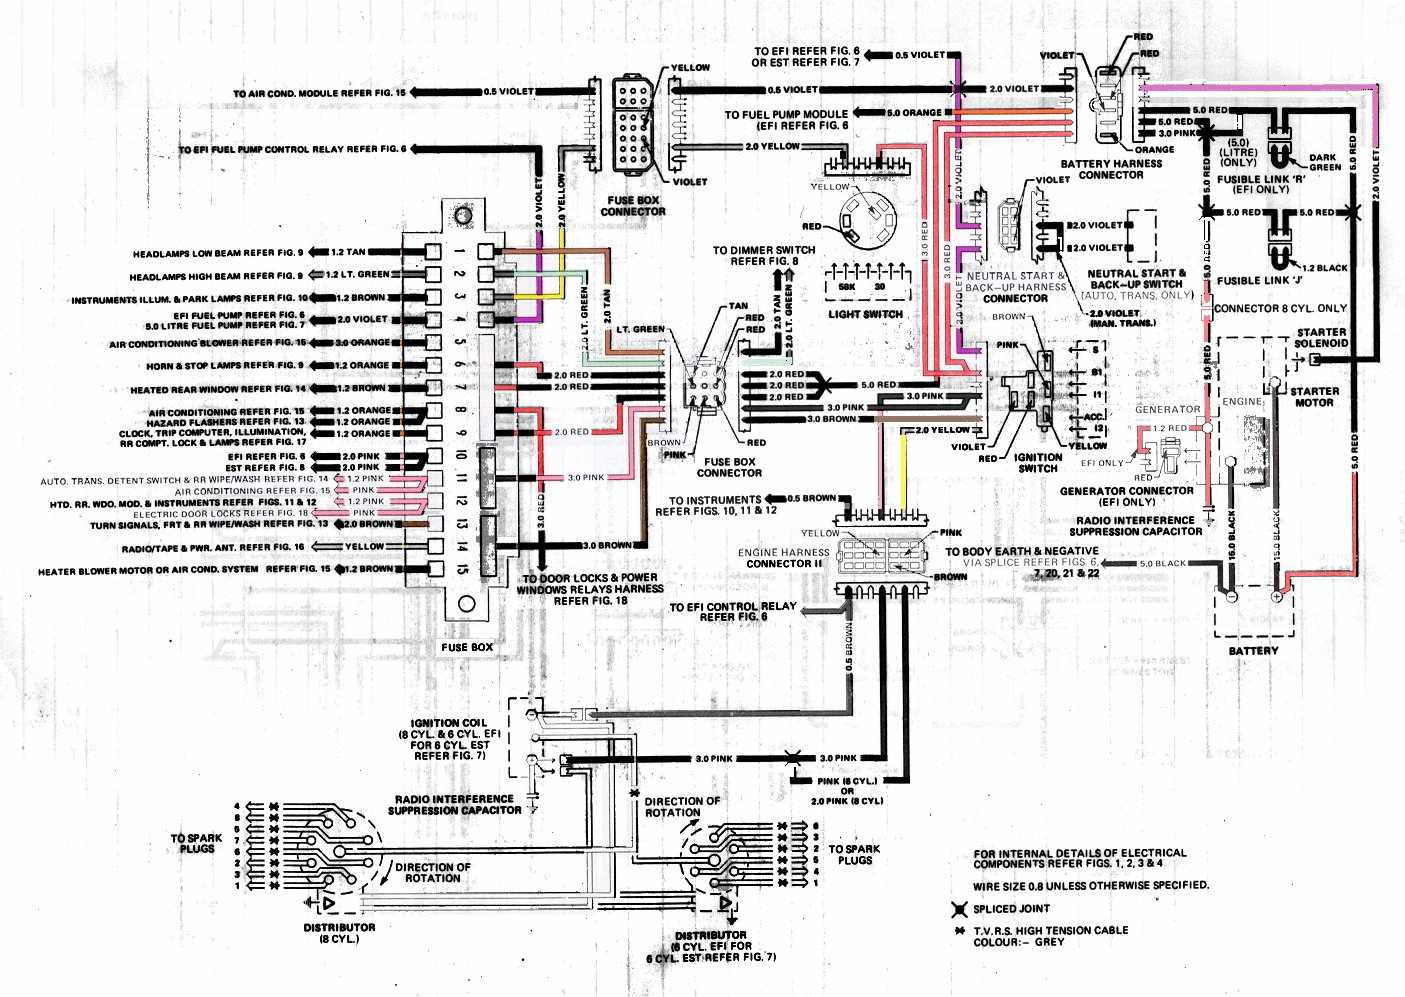 toro wiring diagram for 4000 best part of wiring diagramonan motor wiring  diagram wiring diagramonan 6500